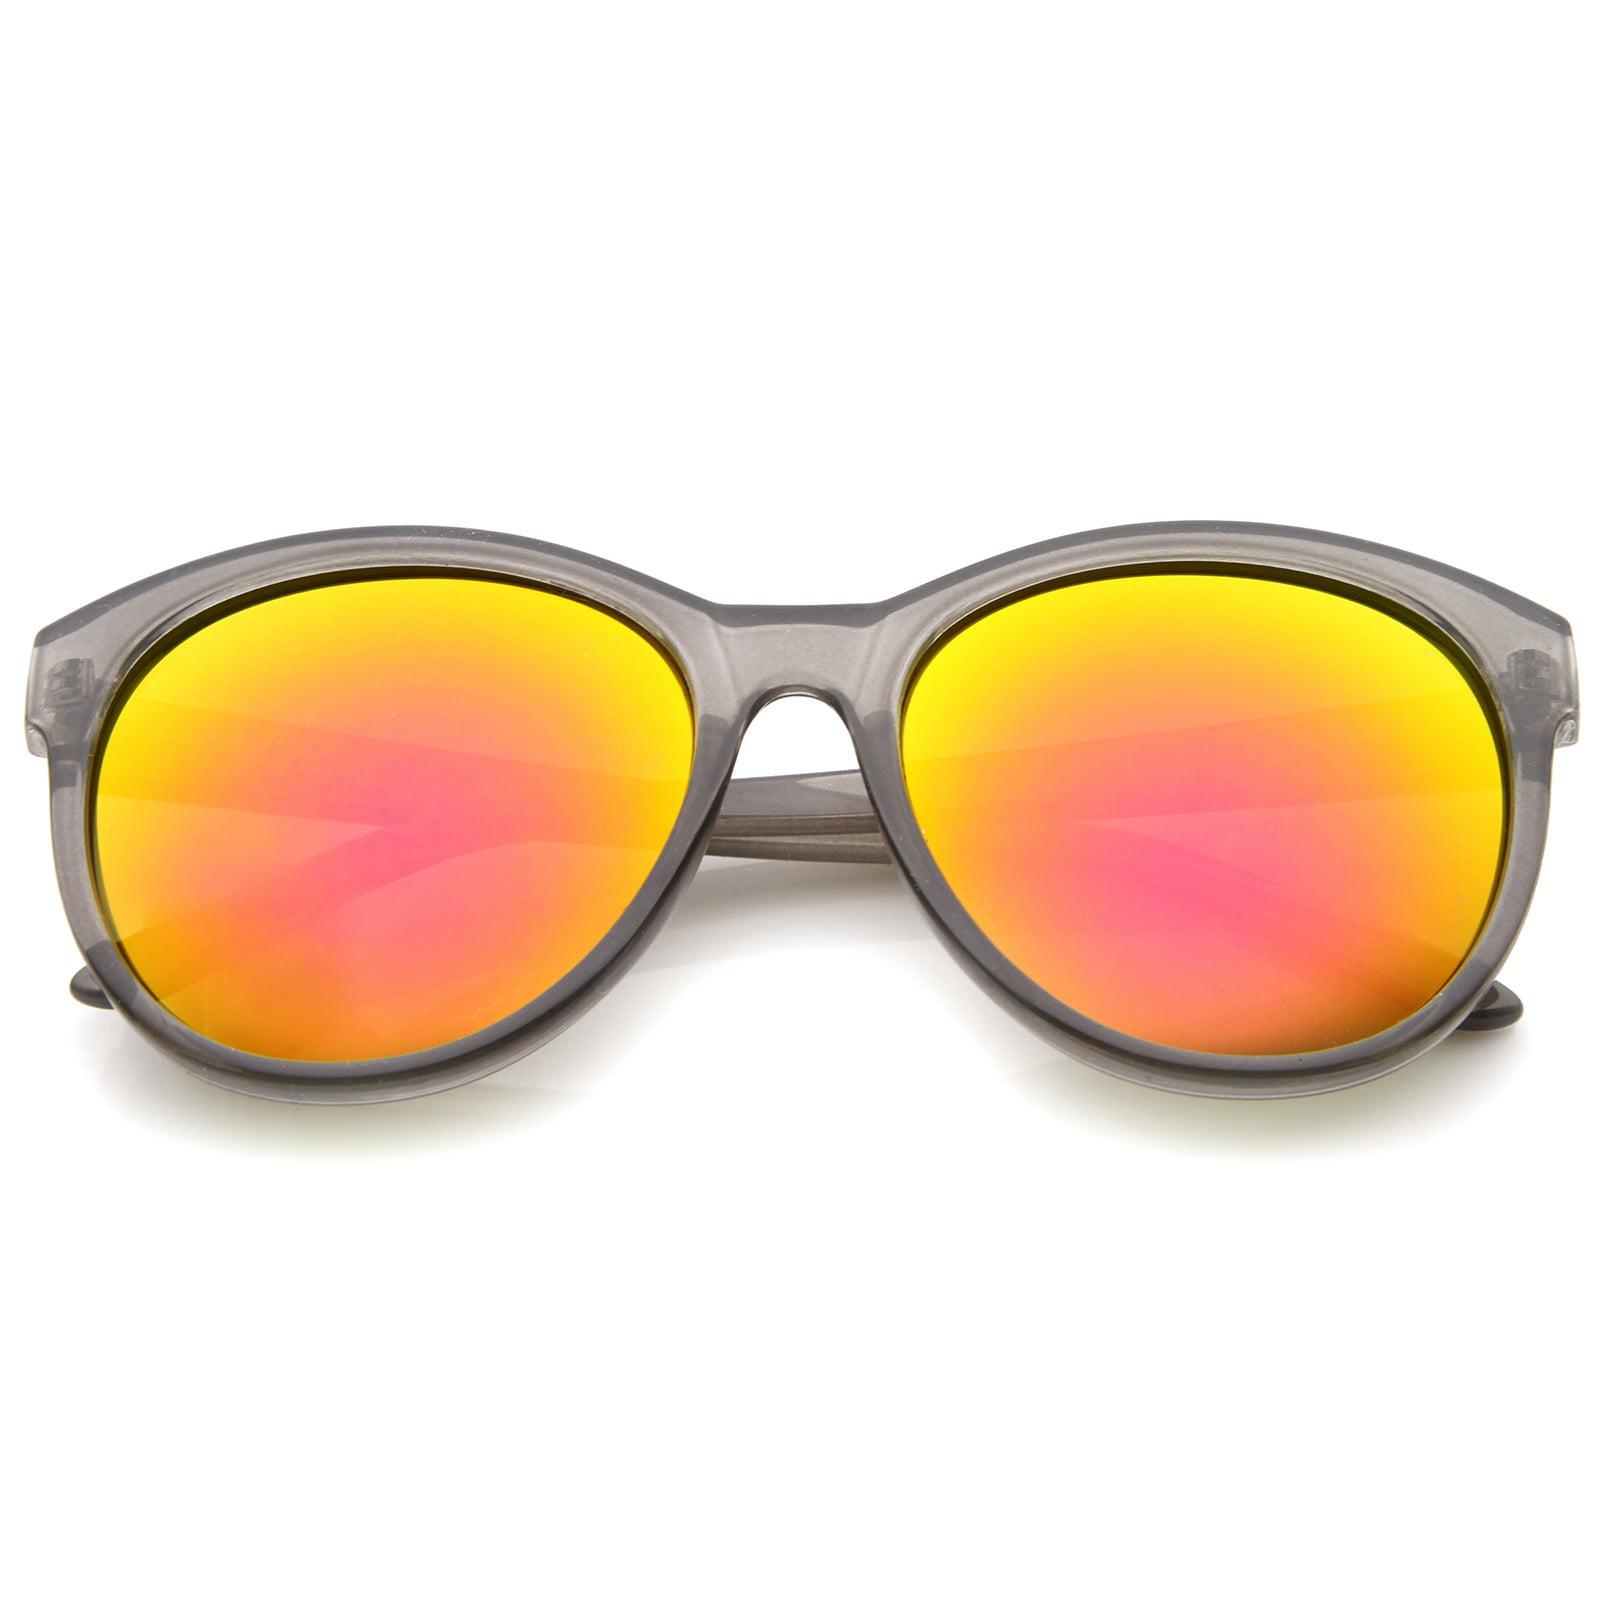 7187d06b11e27 sunglassLA - sunglassLA - Women s Horn Rimmed Color Mirror Lens Oversized  Cat Eye Sunglasses - 58mm - Walmart.com